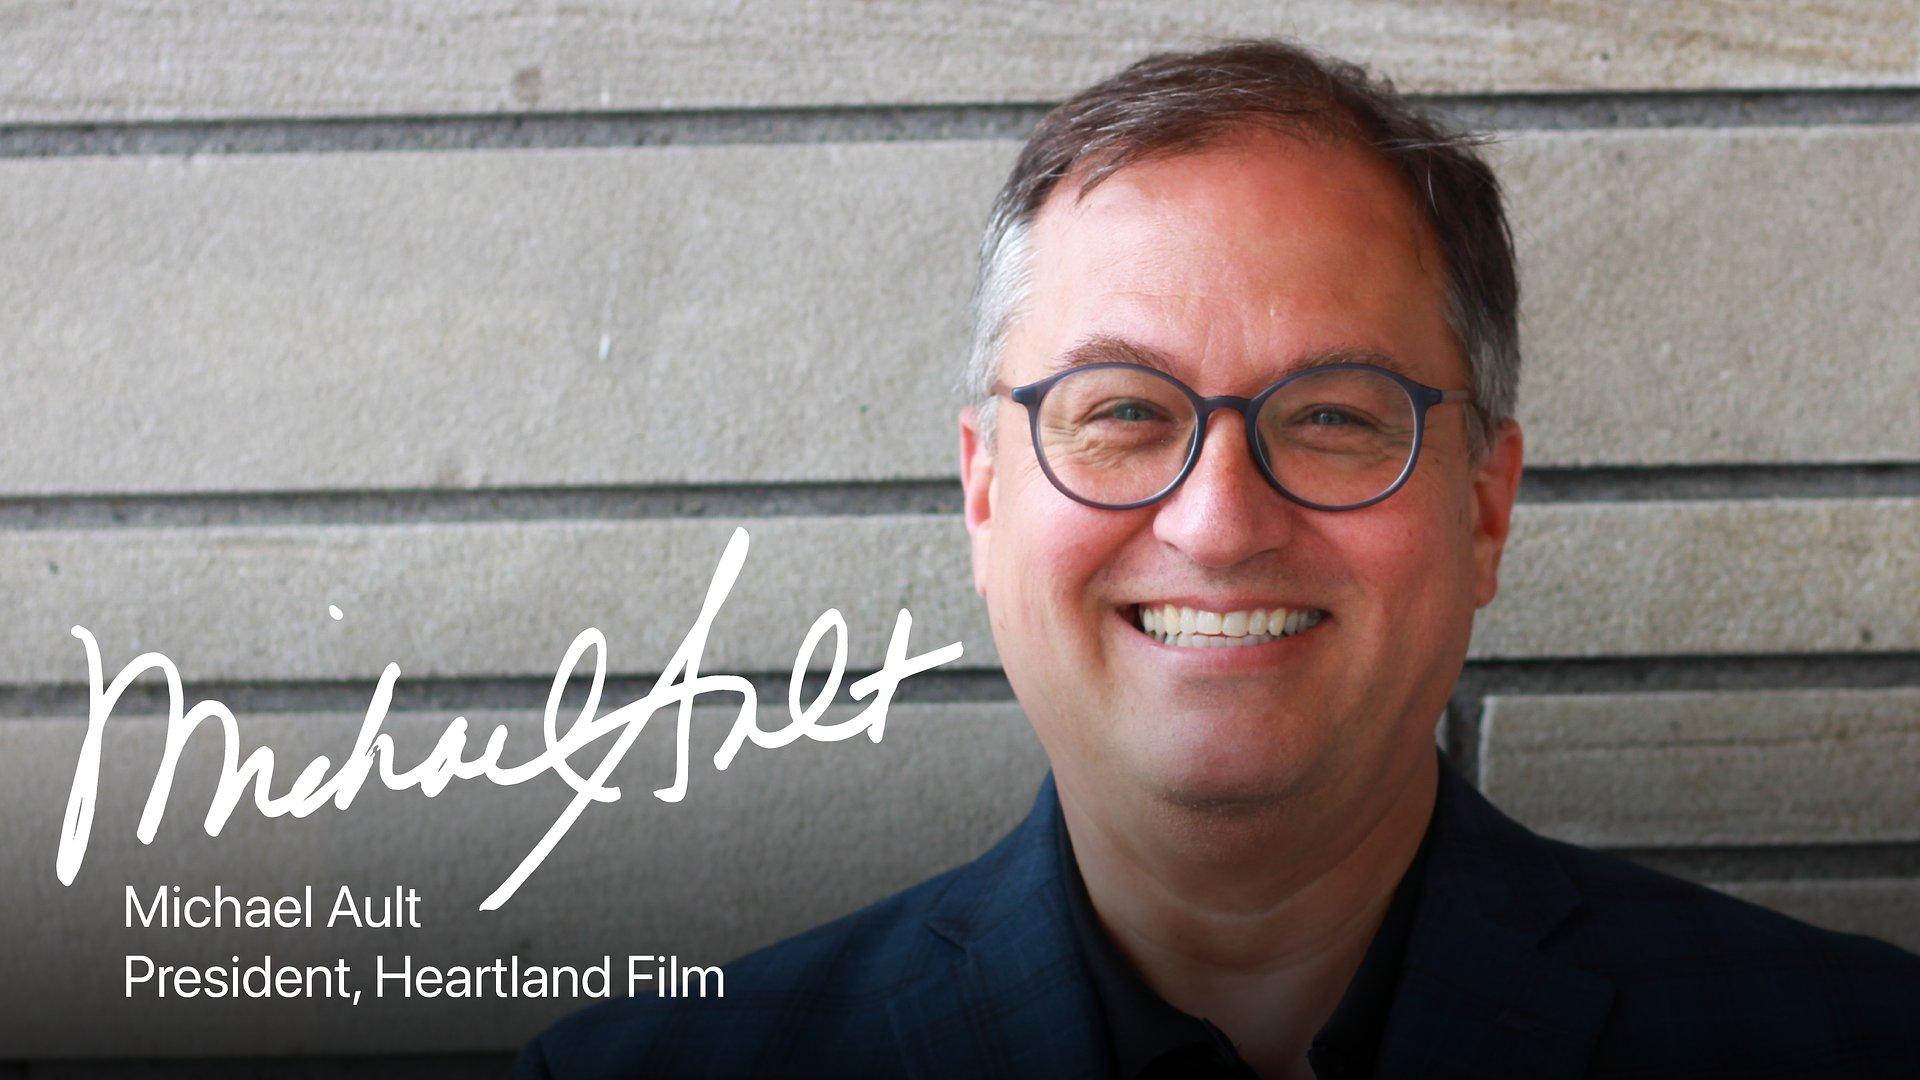 Heartland Film Announces Michael Ault as President in Celebration of the 30th Heartland International Film Festival